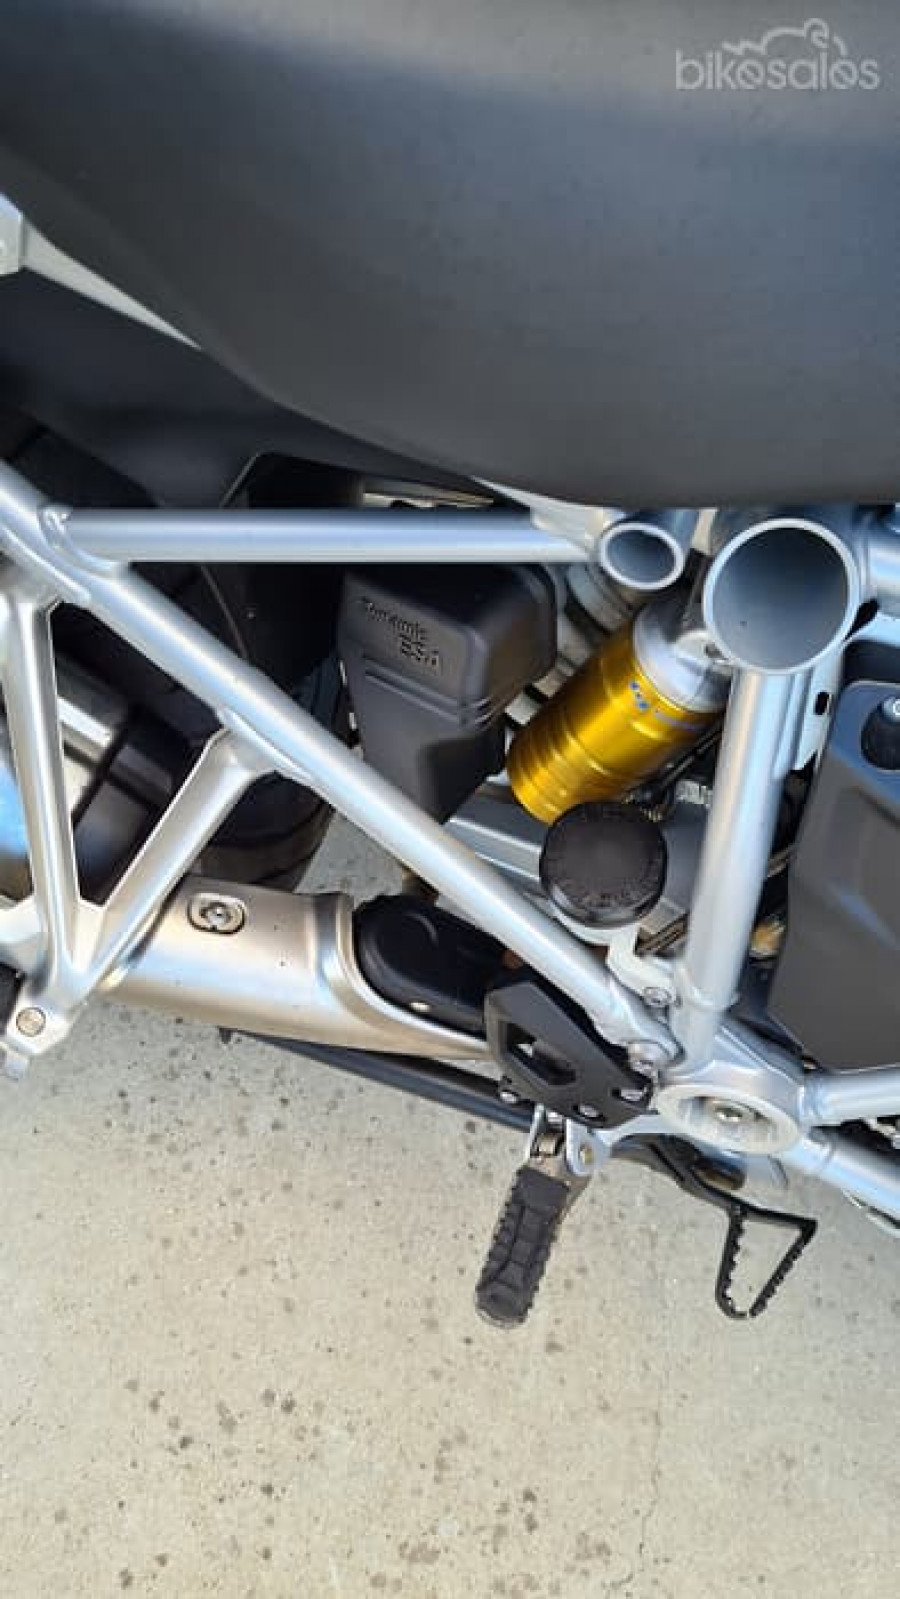 2014 BMW R 1200 GS  R Dual Purpose Motorcycle Image 11